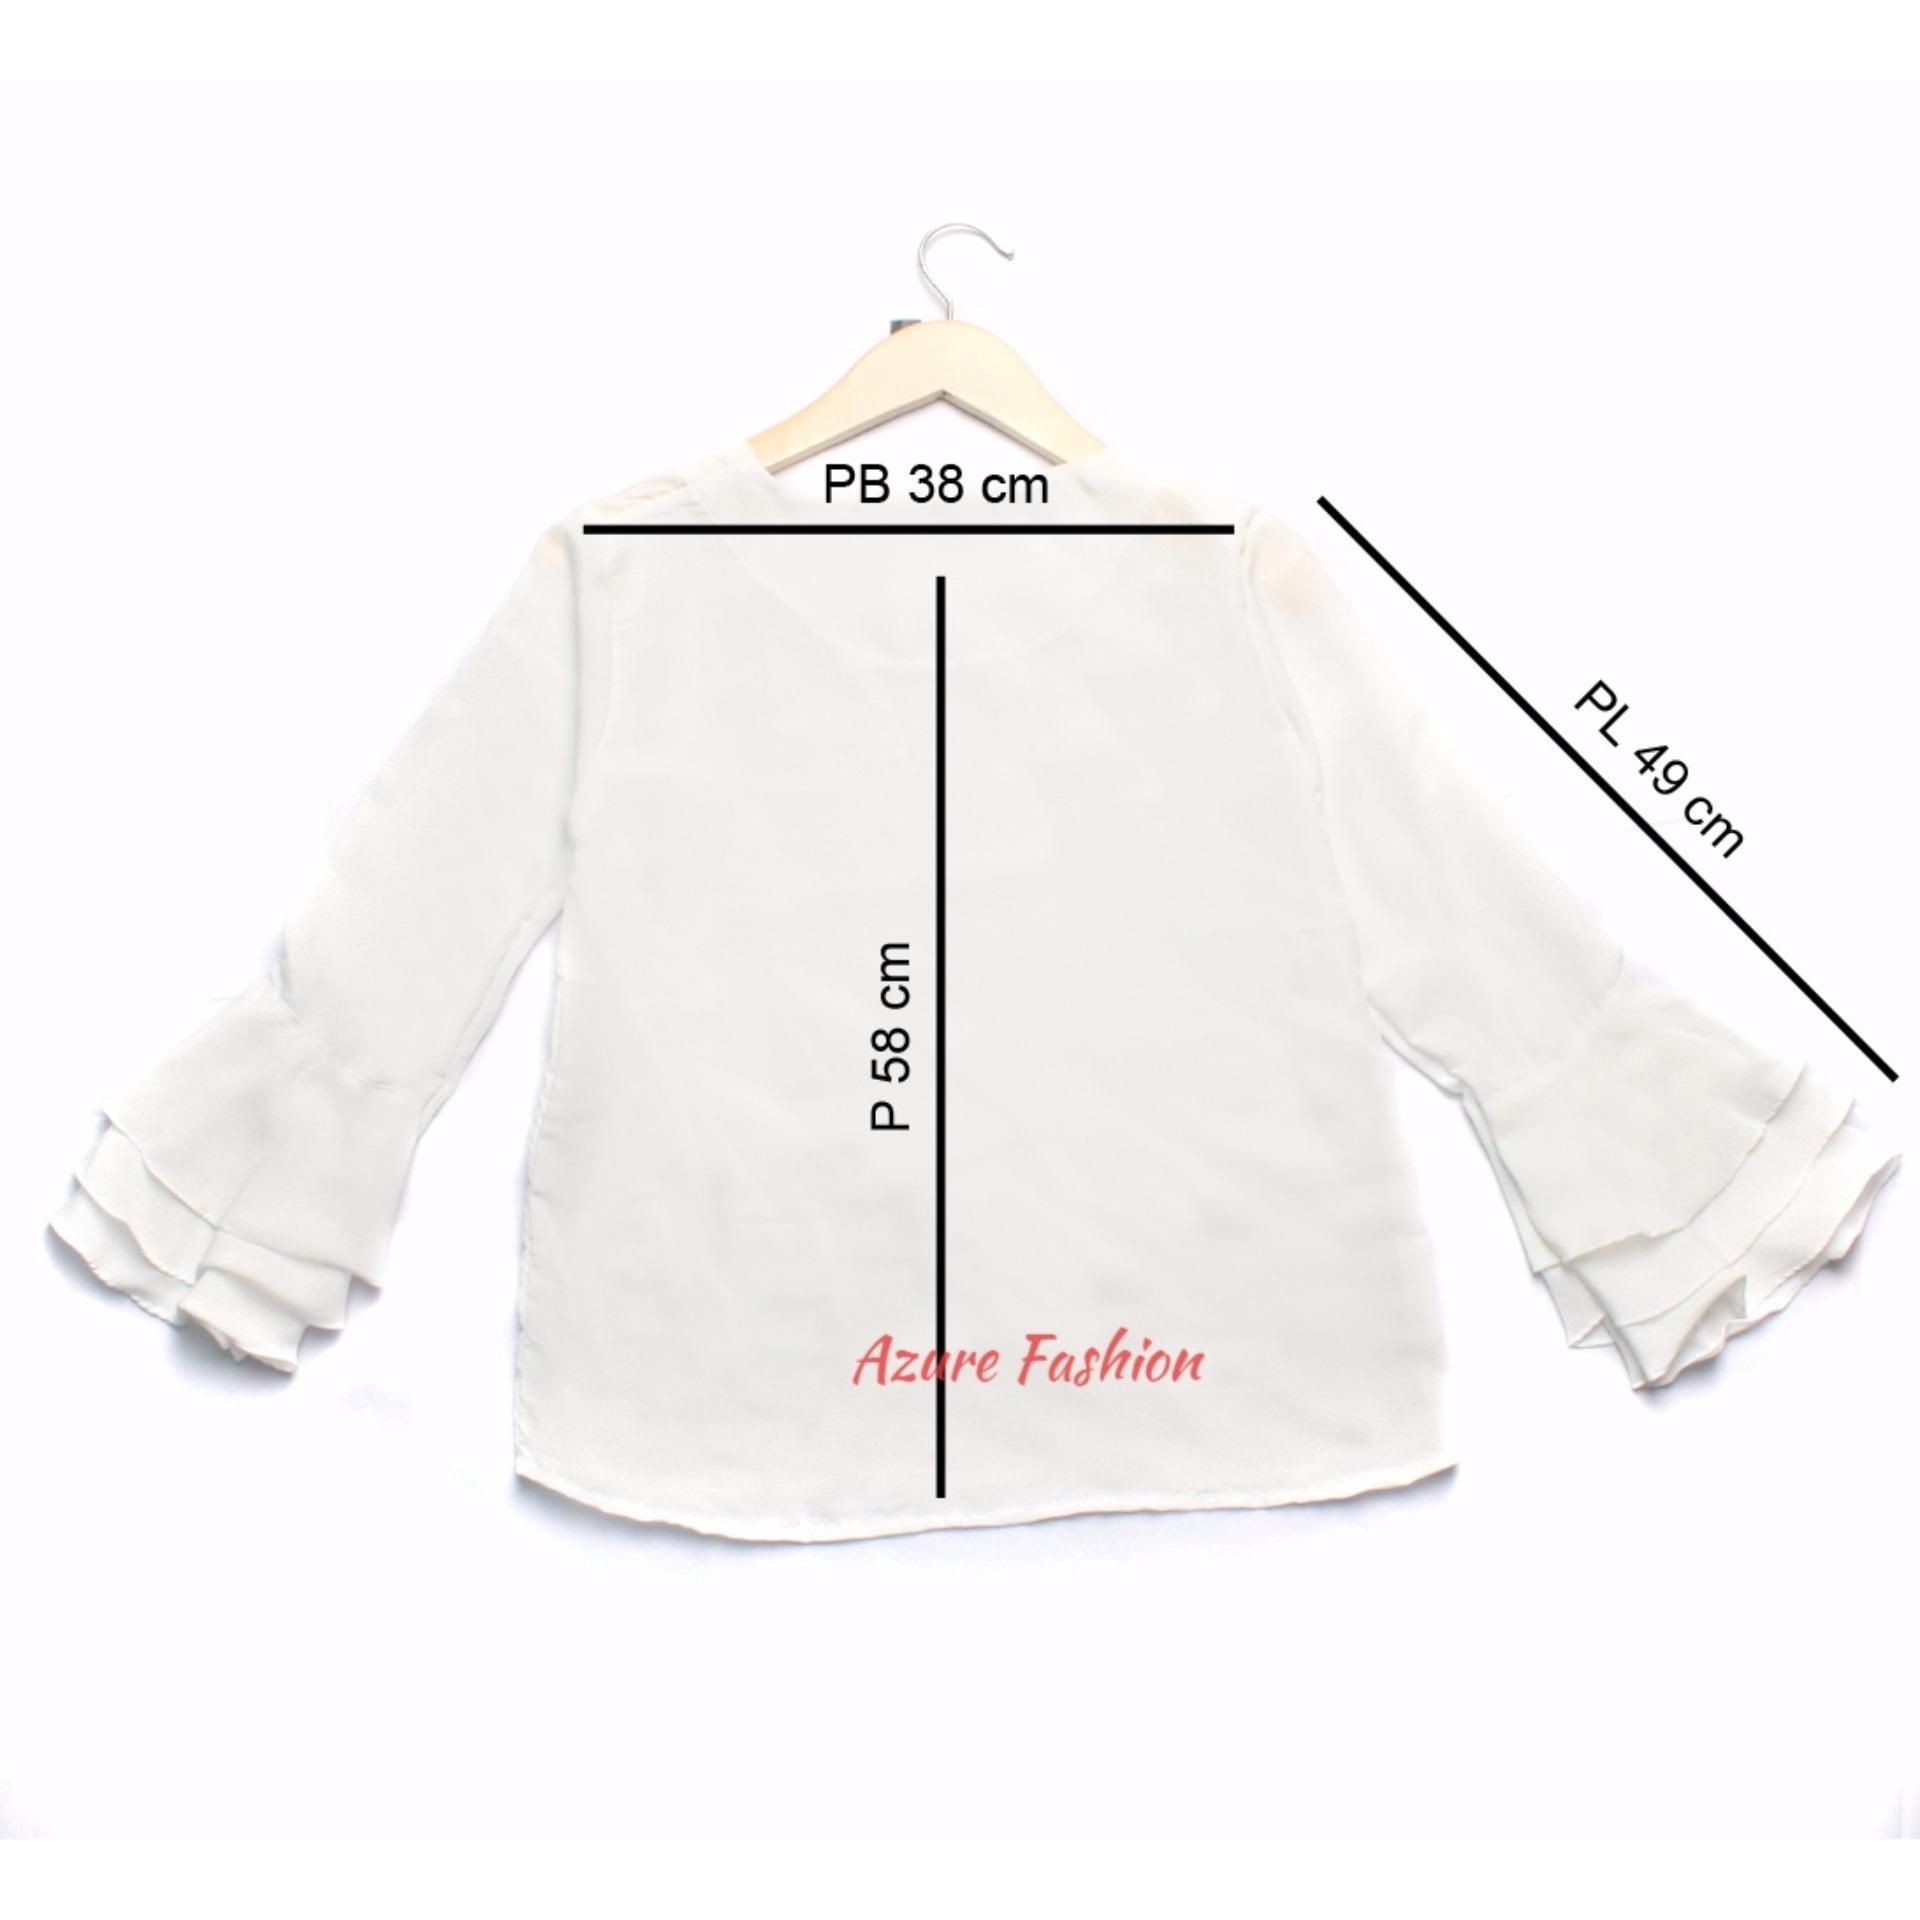 Reyn Shop Blouse Erkud Top Putih Tunik Wanita Baju Atasan Baju